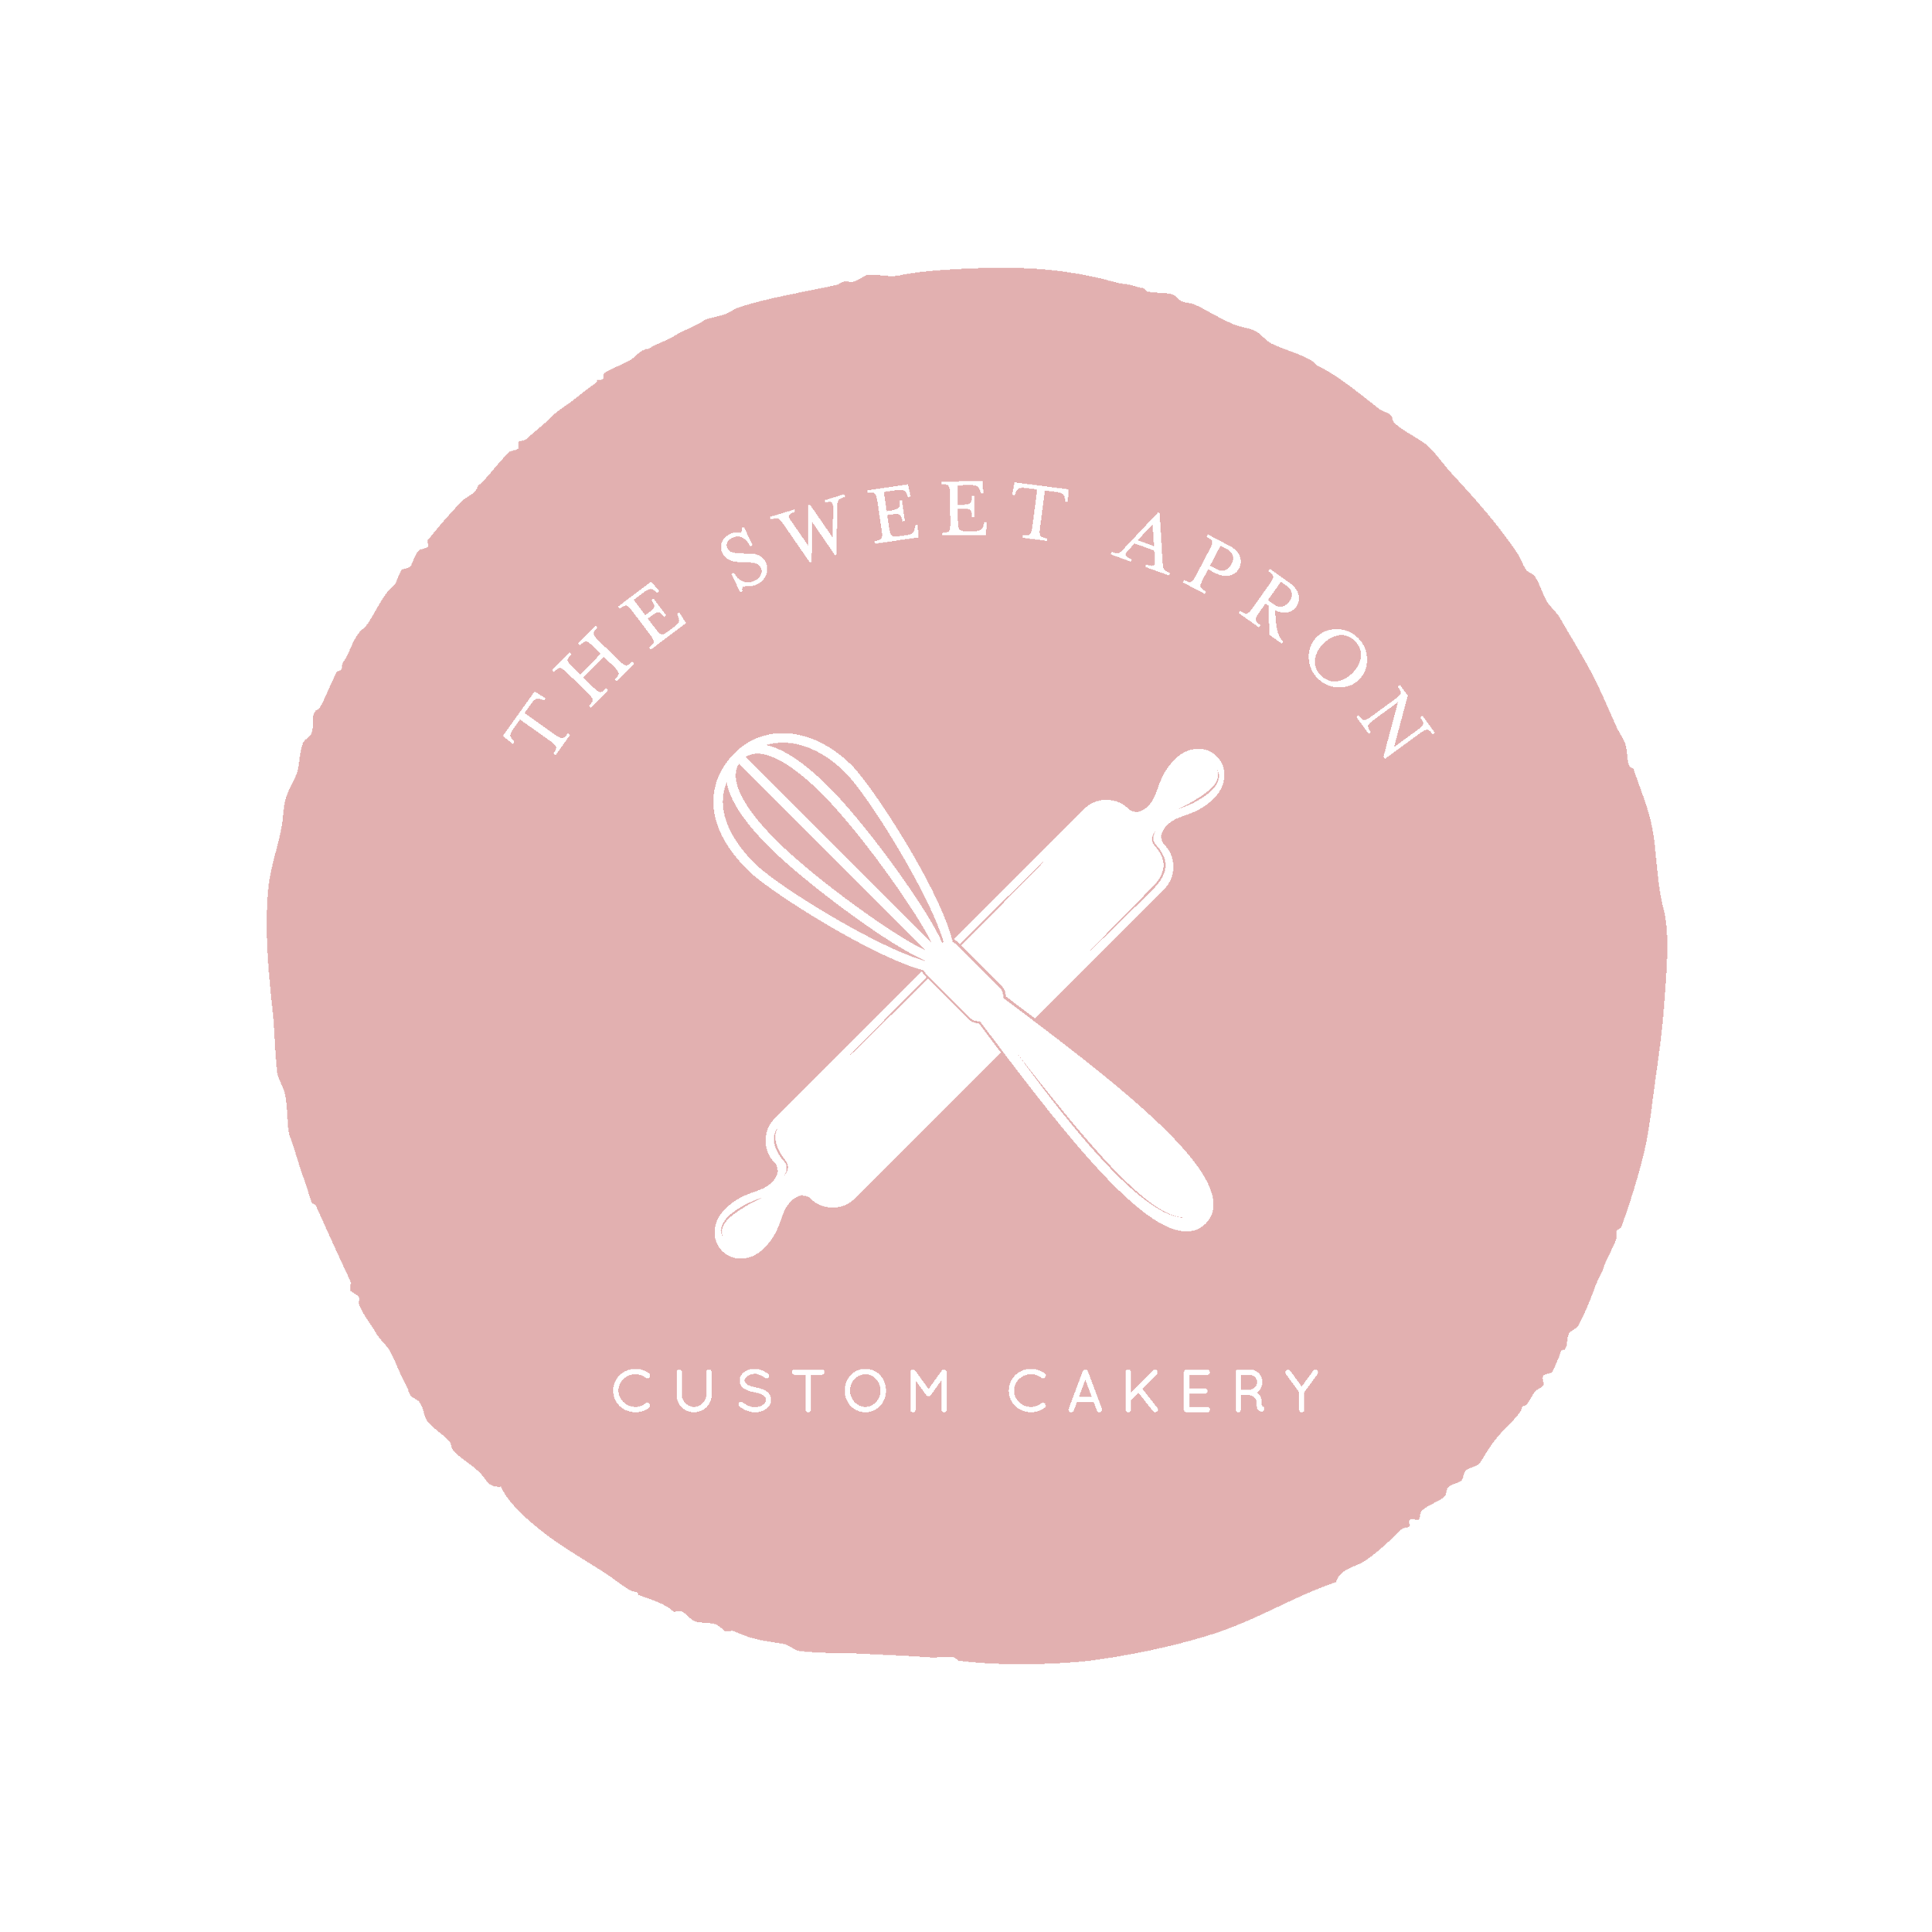 sweet apron logo transparent back-03.png